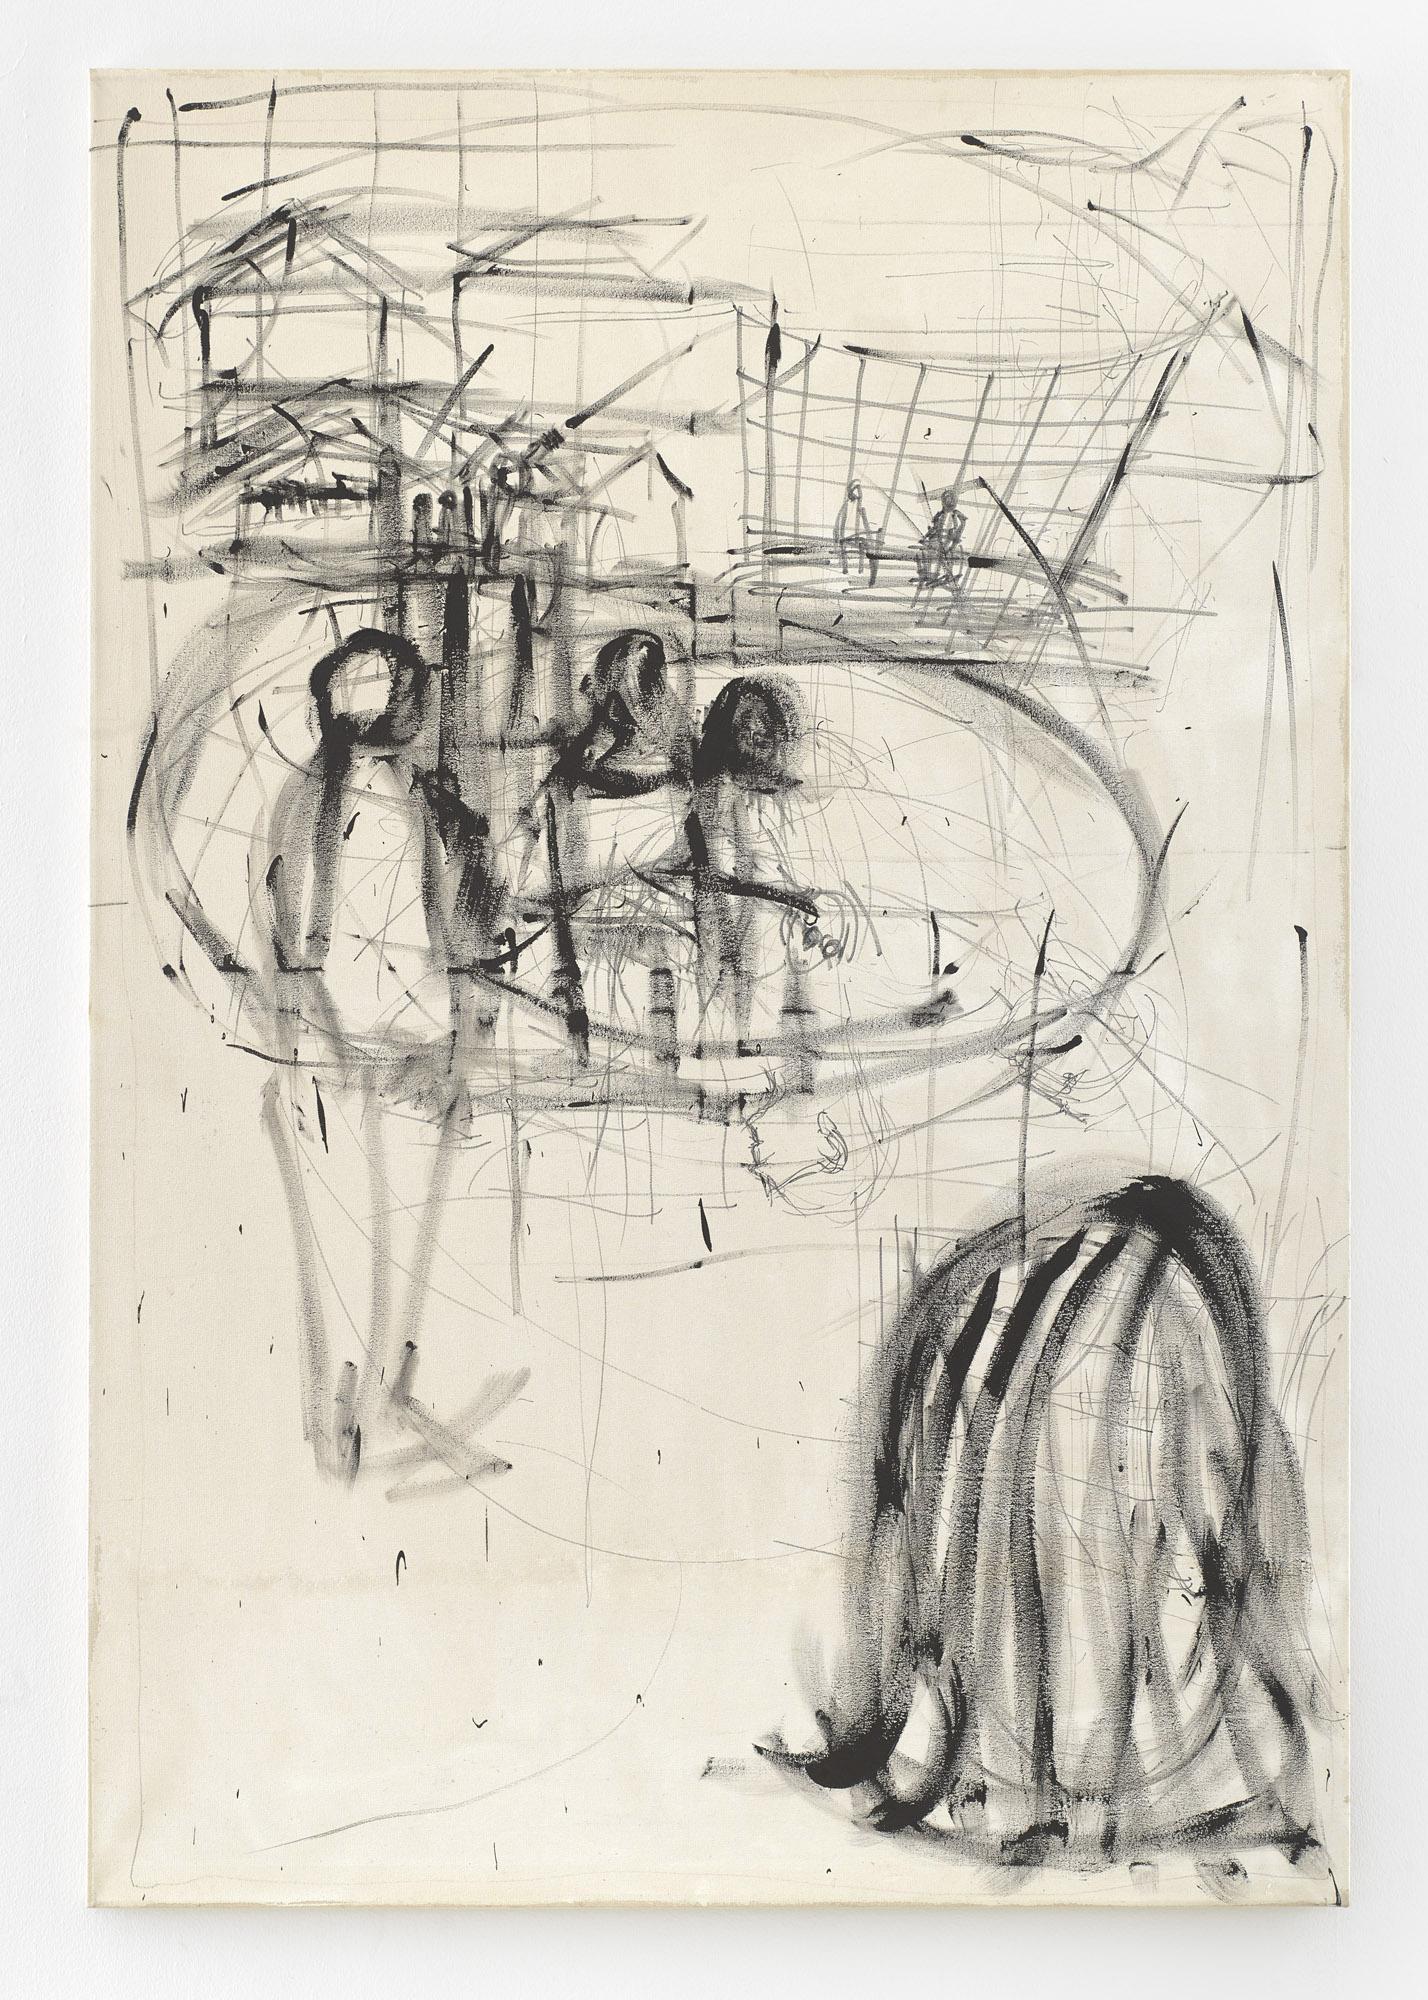 Education | 2000 | Acryl auf Leinwand | 215,5 x 146,5 cm